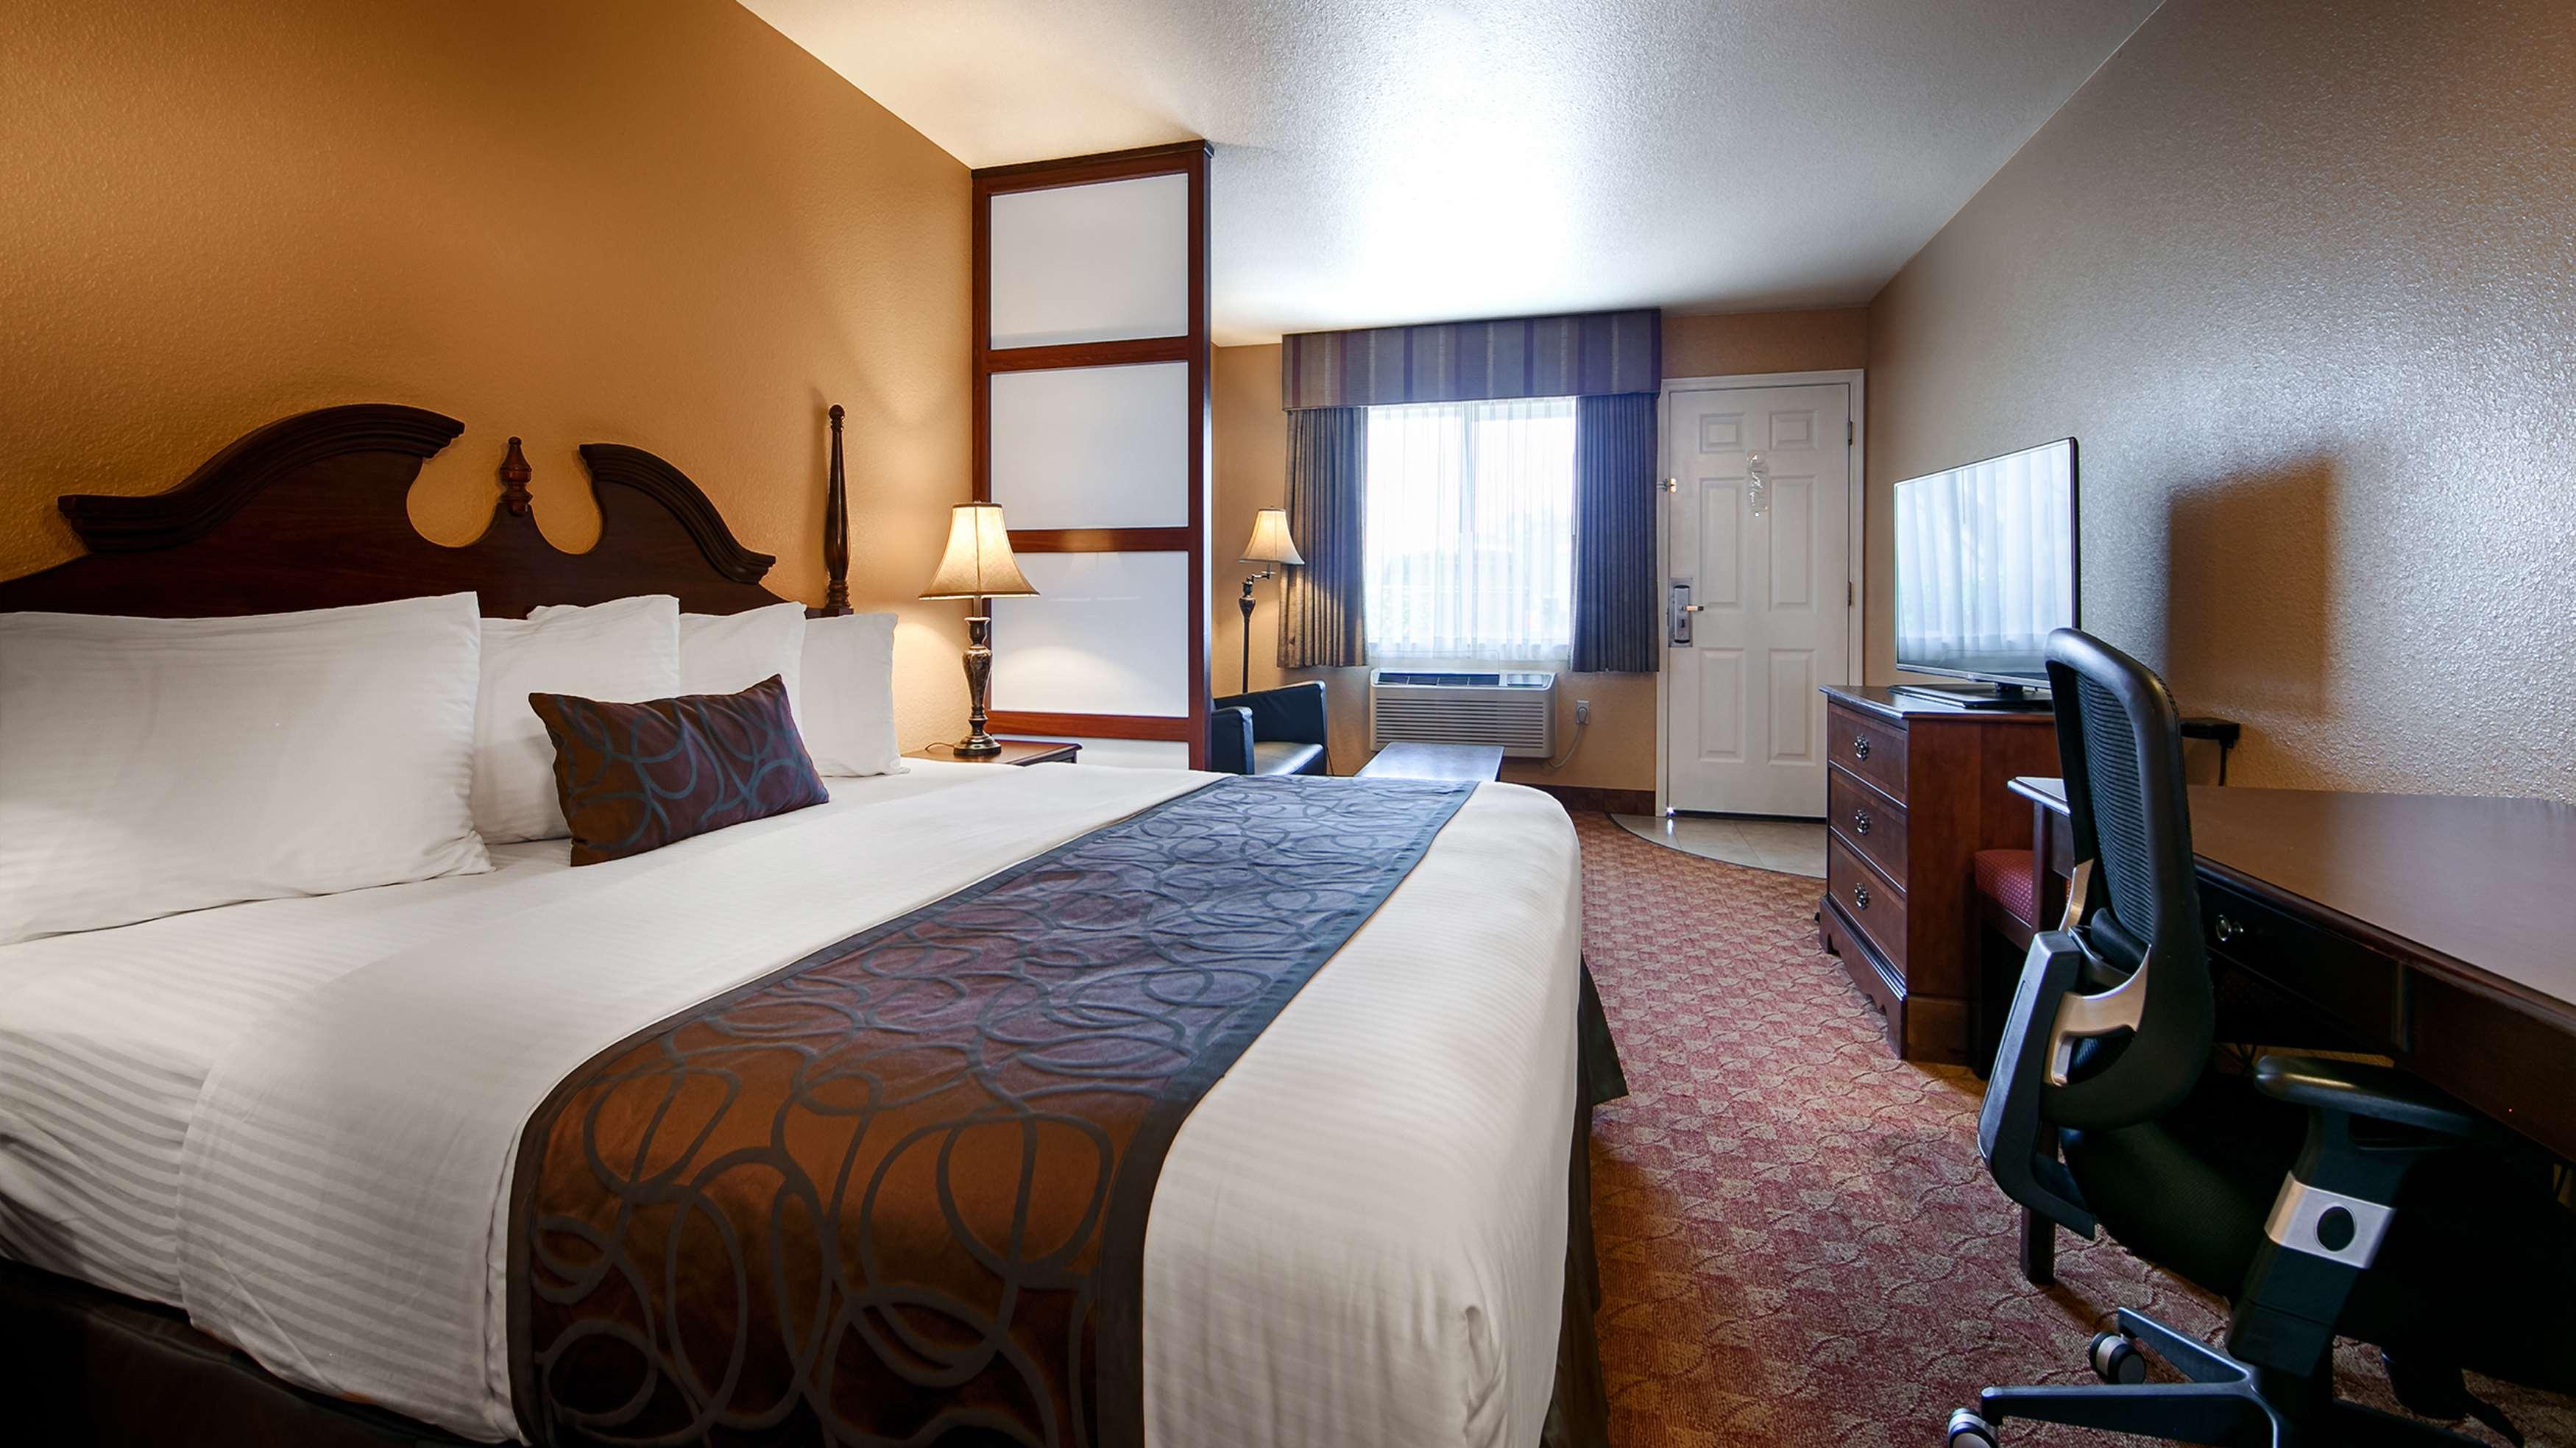 Best Western Fallon Inn & Suites image 16